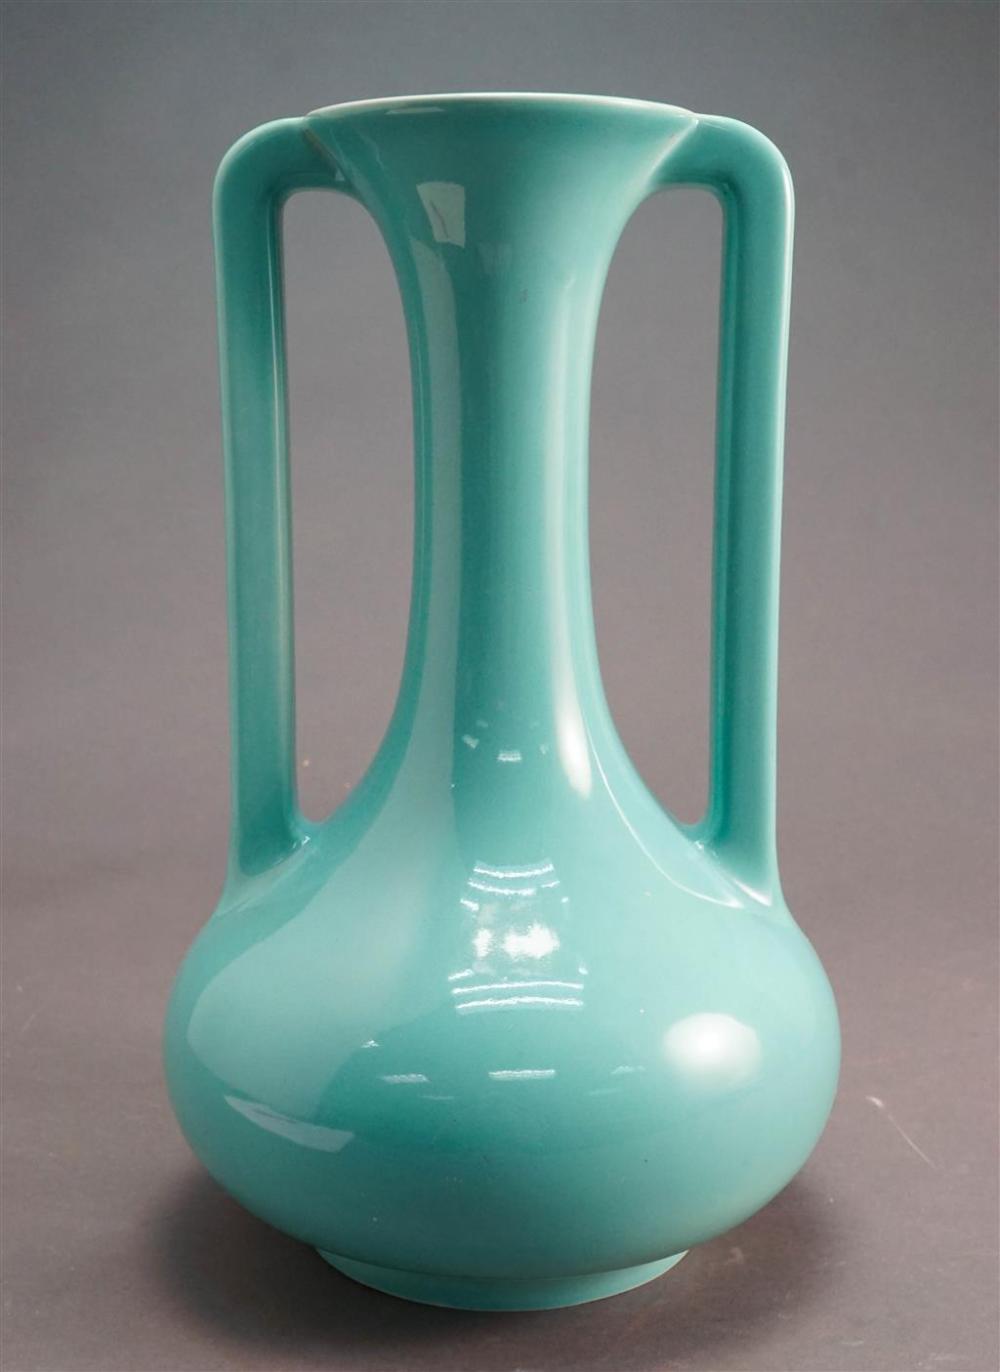 Trenton Pottery Turquoise Glazed Two Handle Vase, H: 16 in